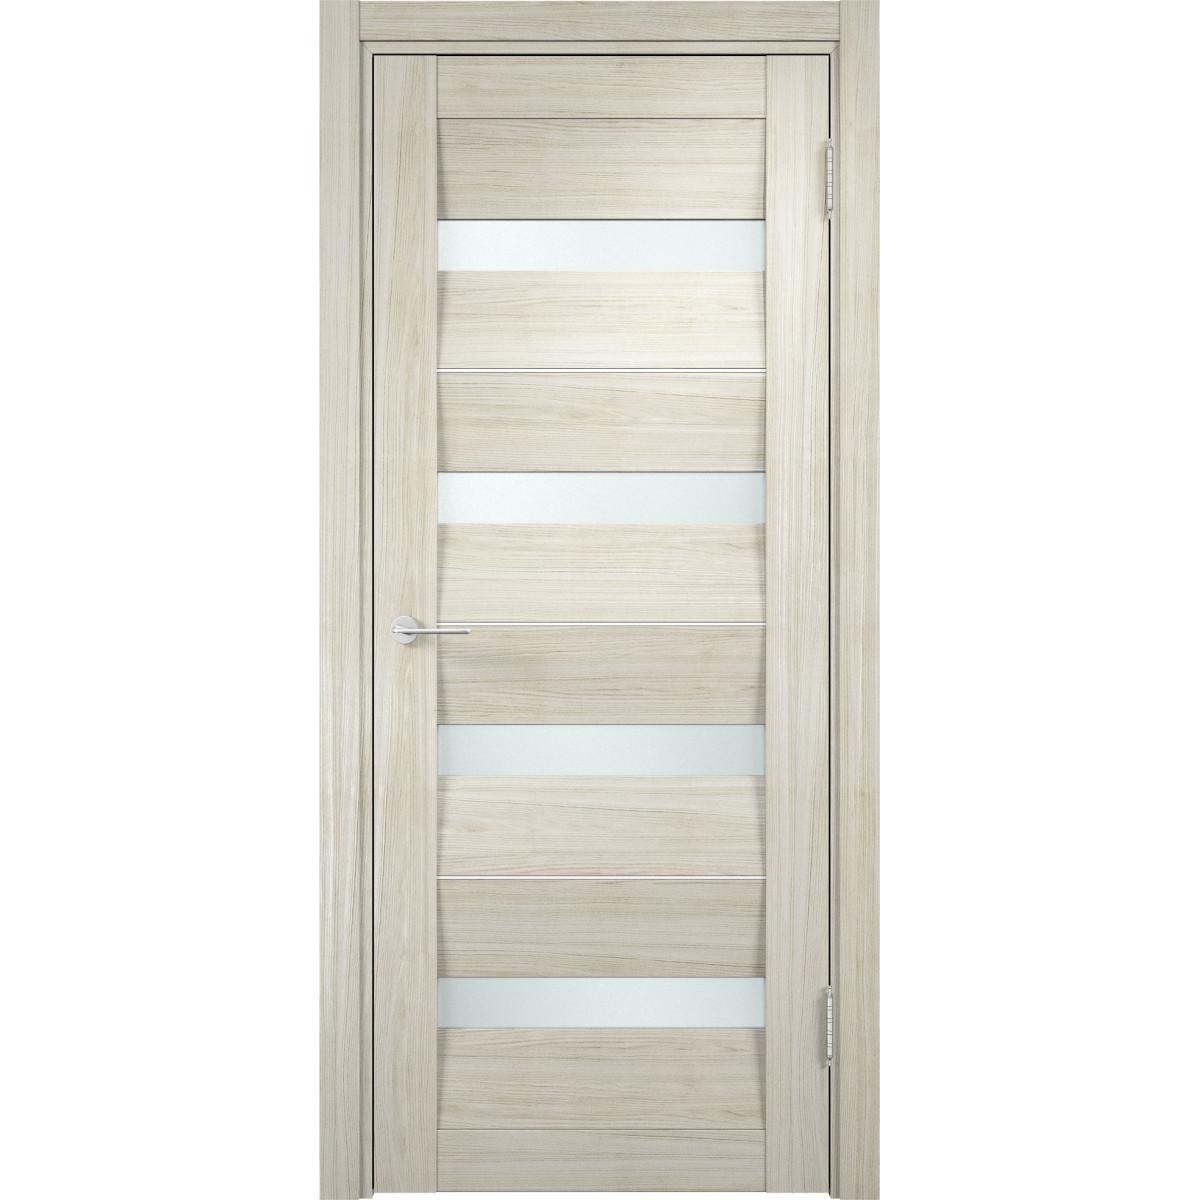 Дверное полотно Casaporte Сицилия МП_0126 2000х700х44 мм МДФ